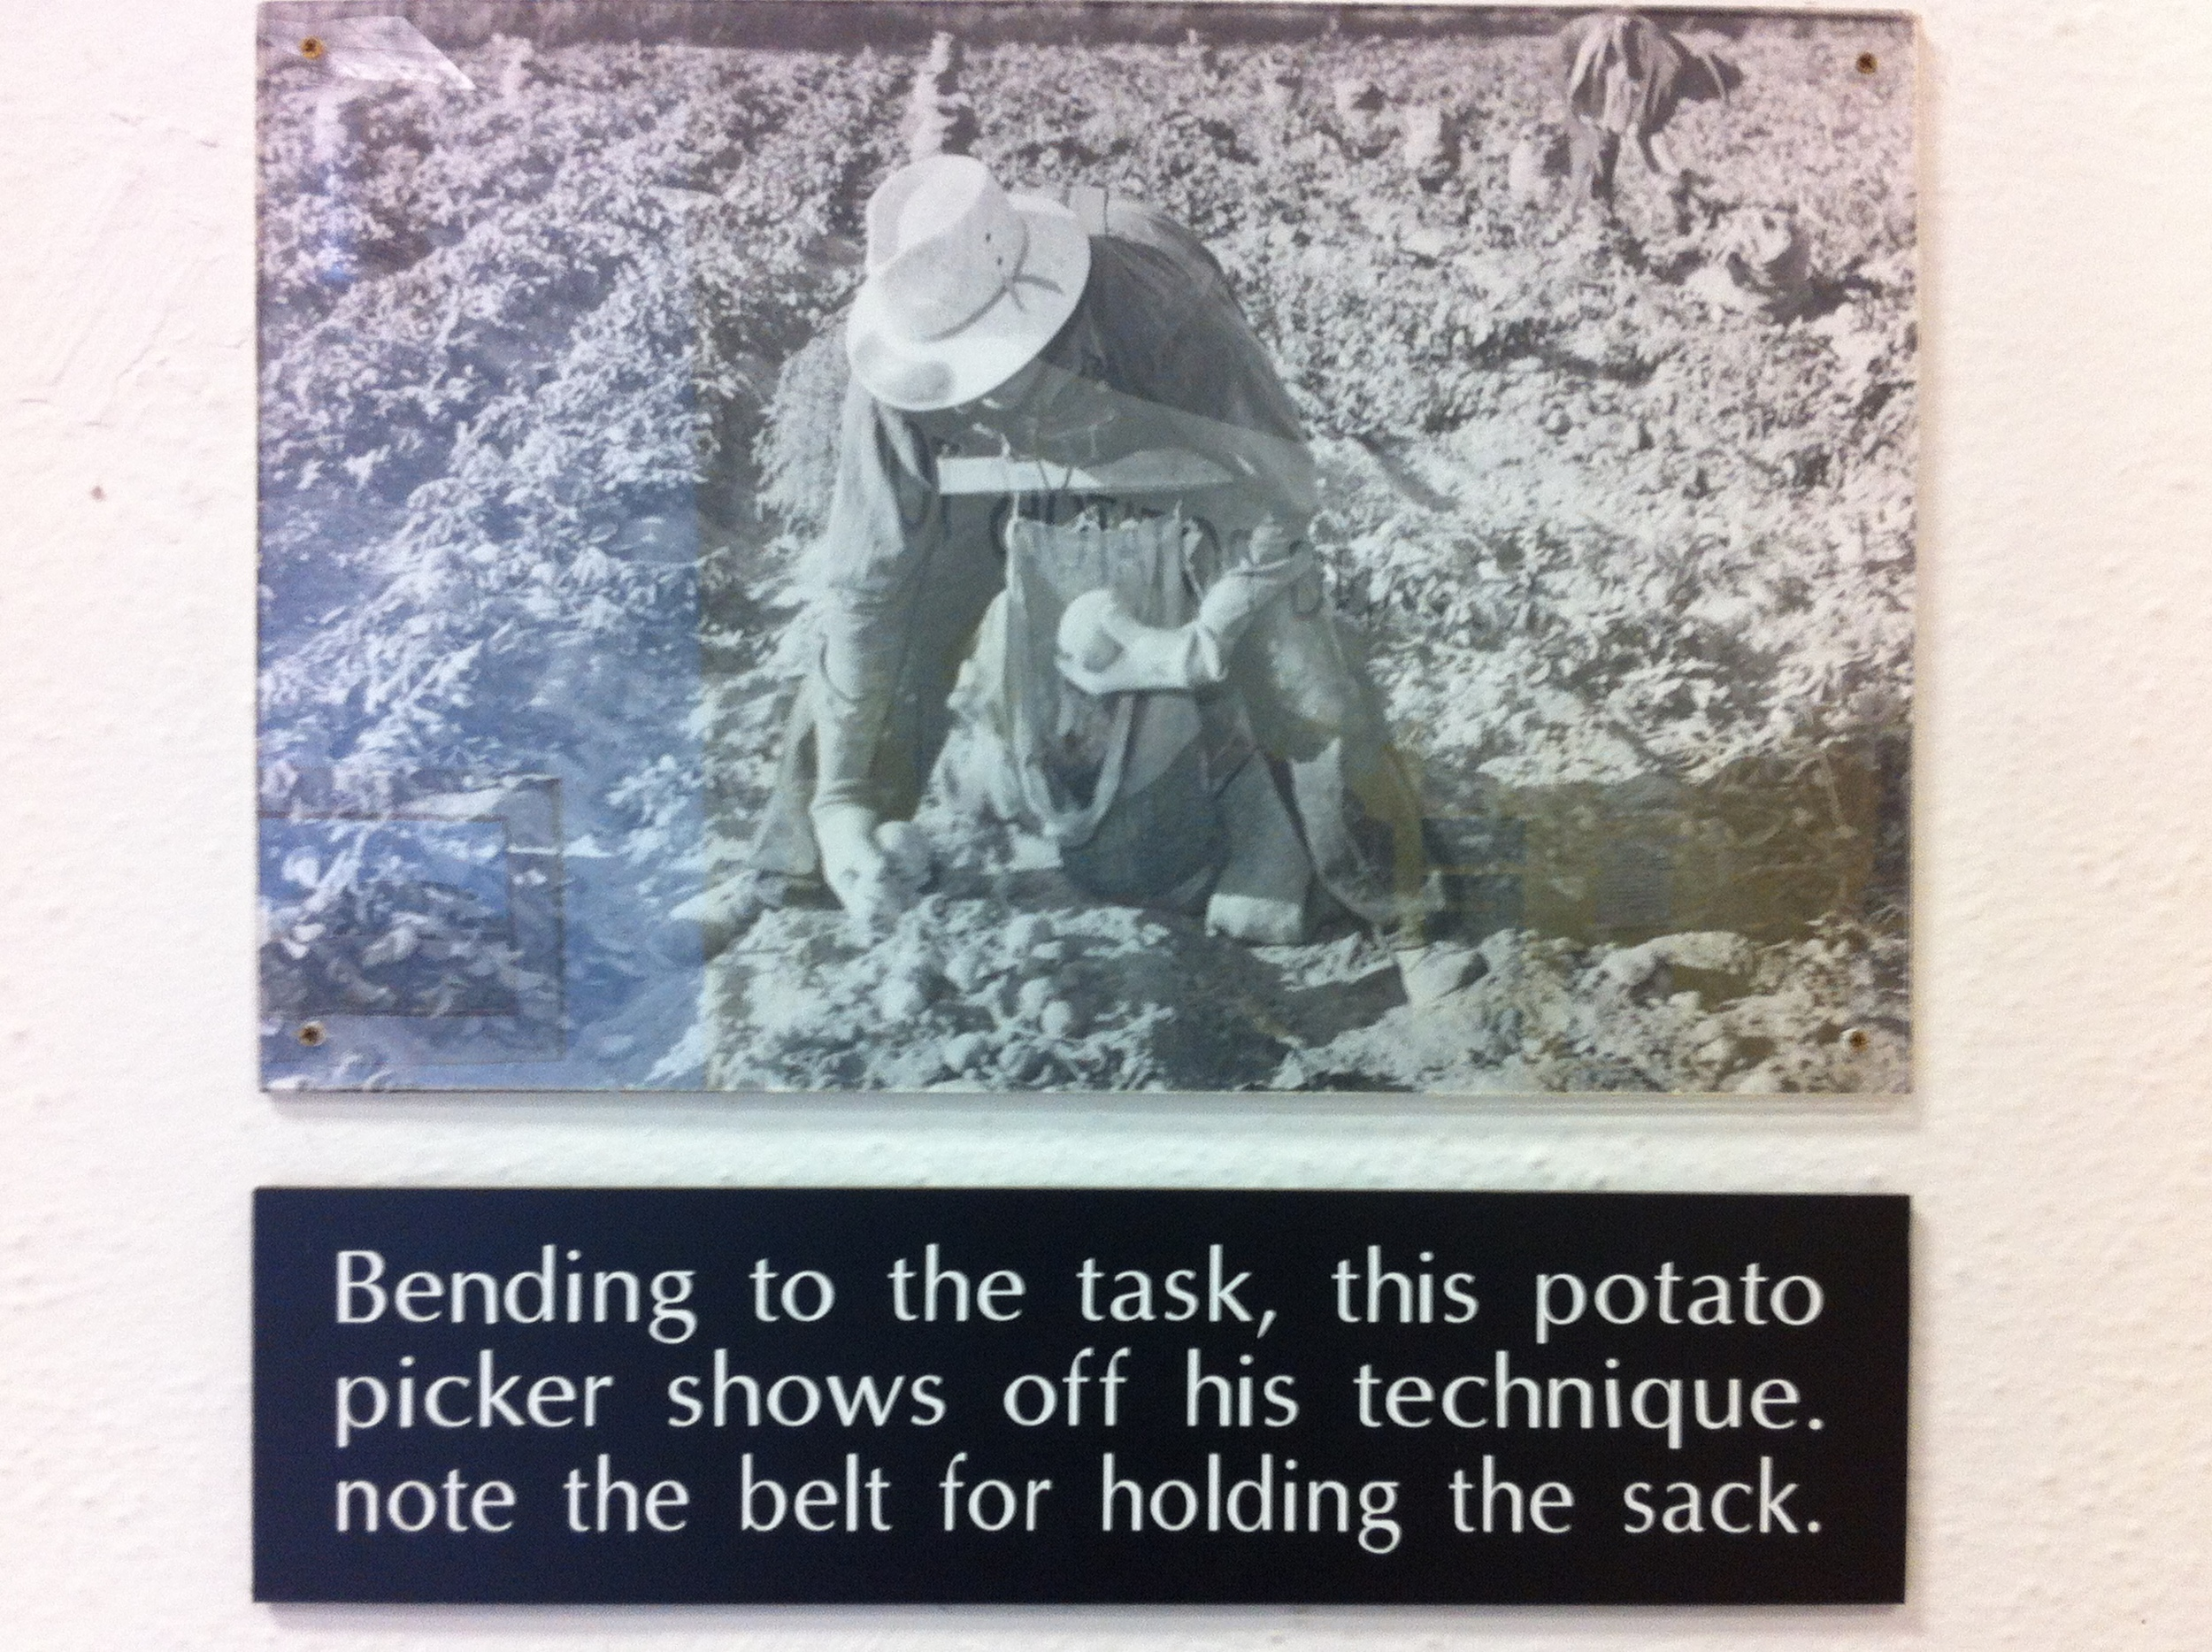 potato pickers